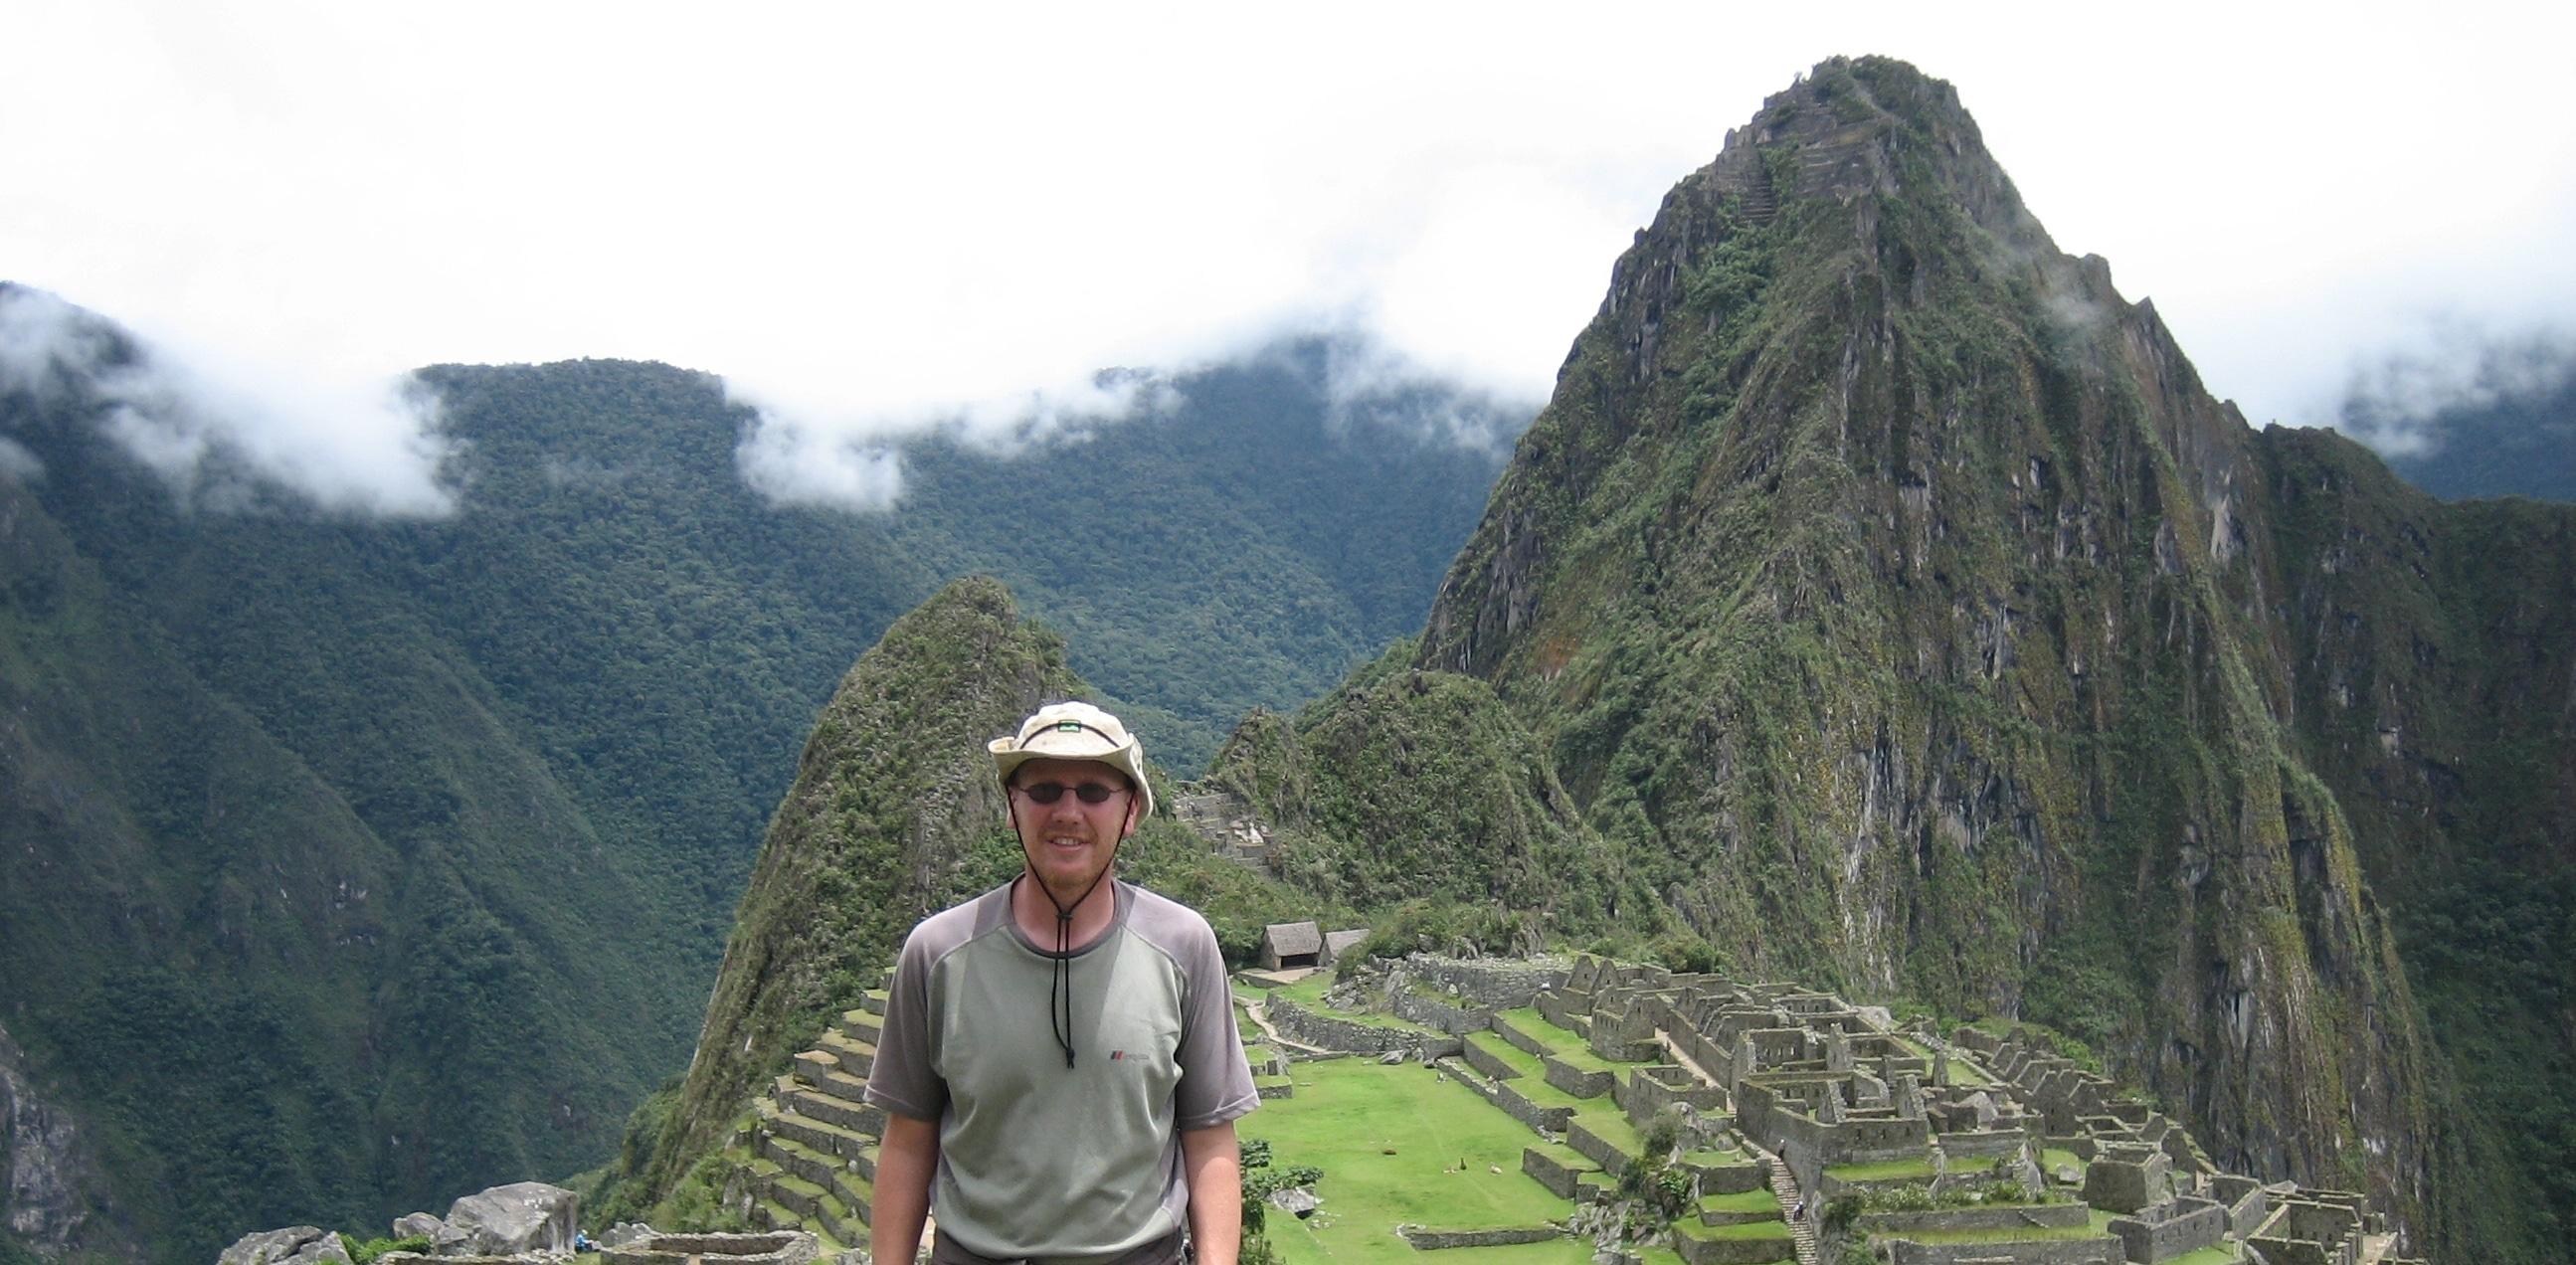 Founder Jim Elliott at Machu Picchu